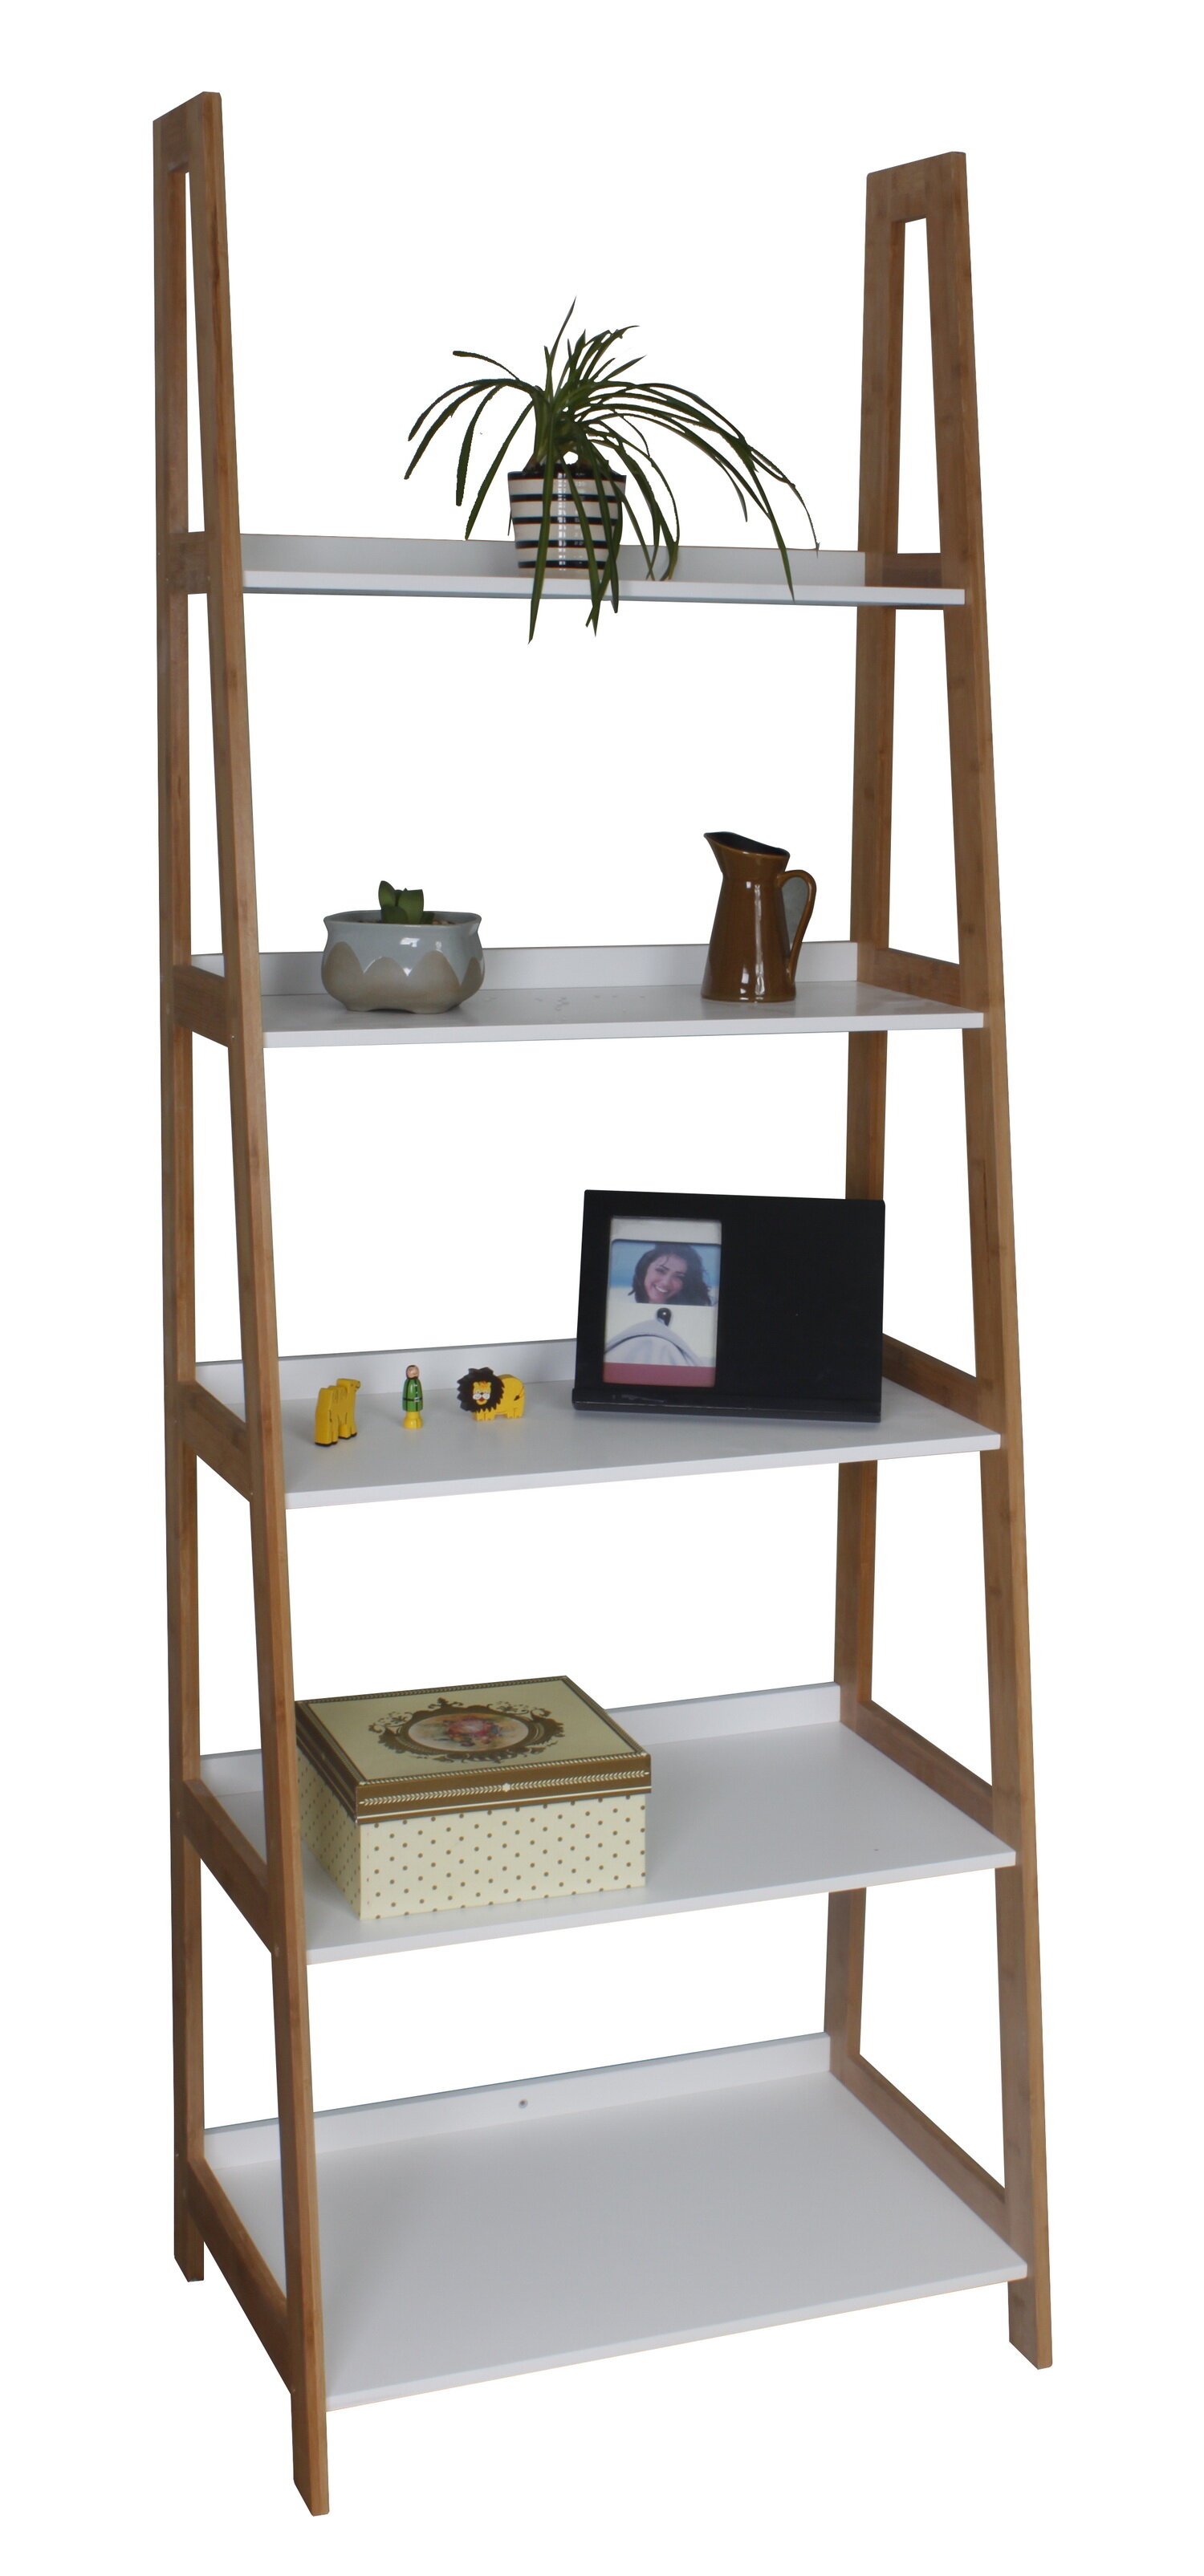 Hokku Designs 5 Tier Wooden Bamboo Storage Ladder 180cm Bookcase Reviews Wayfair Co Uk